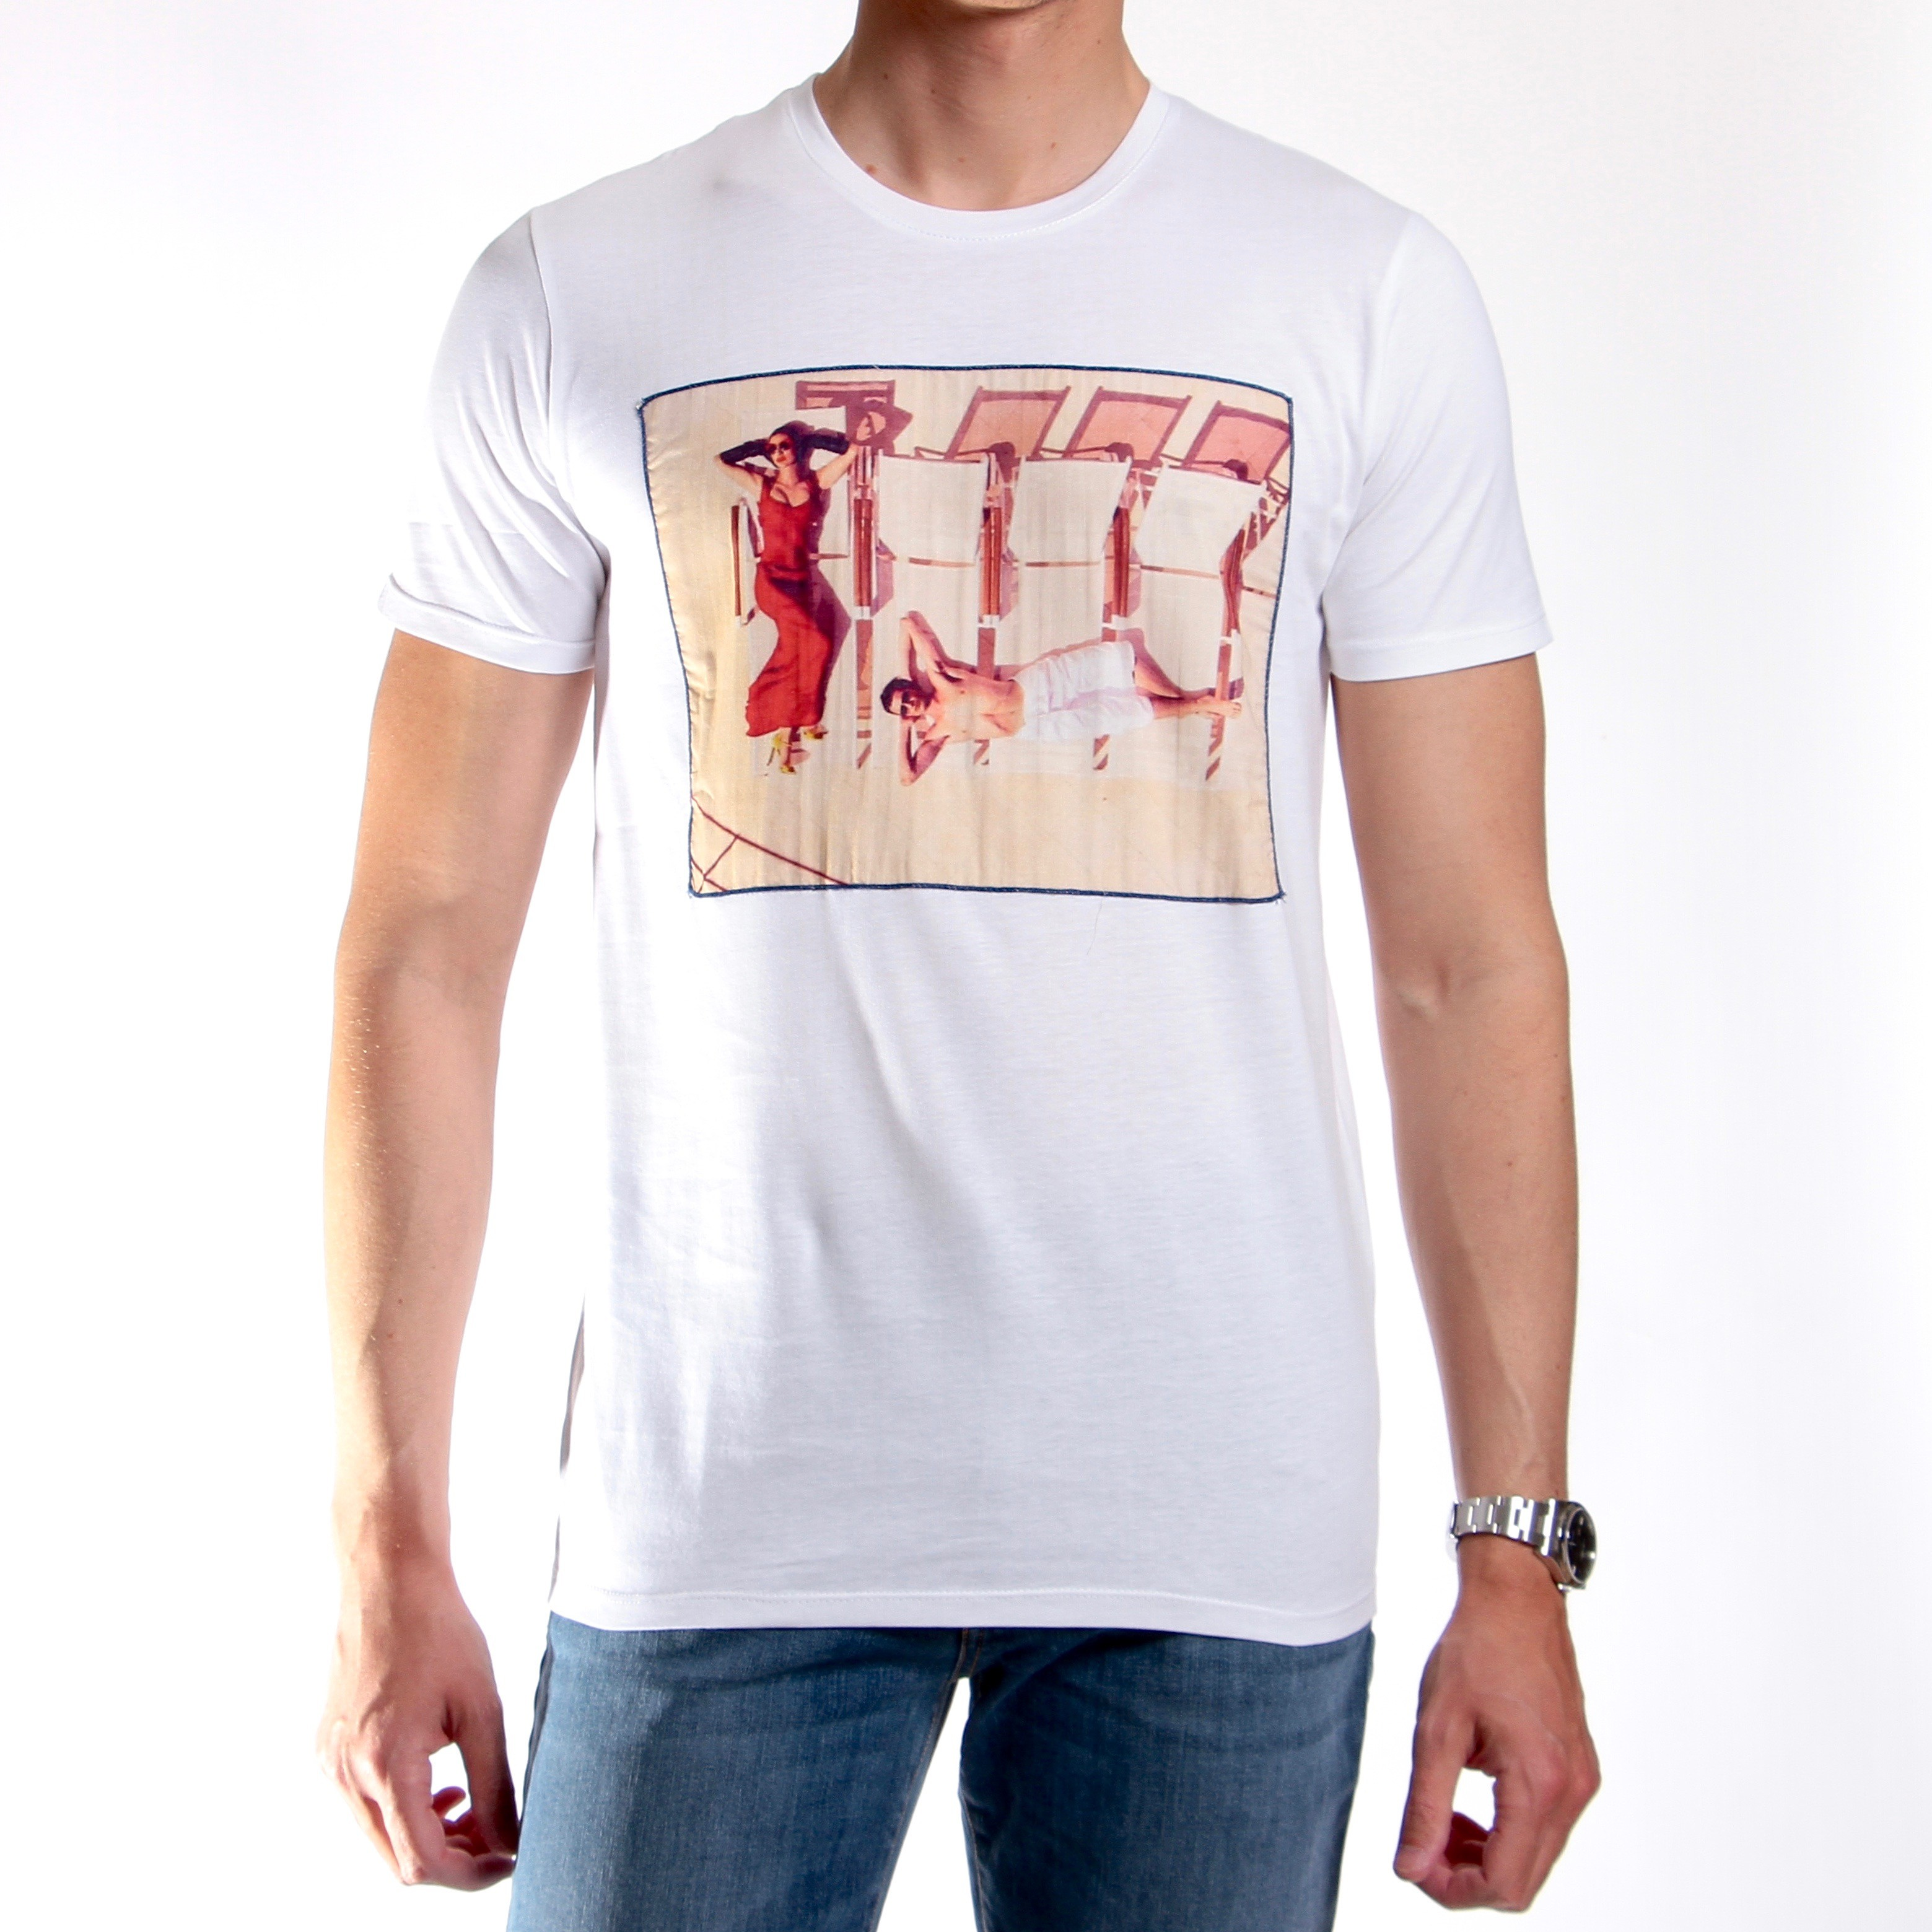 Tee-shirt Stampa beach : blanc - coton (Tee-shirt)